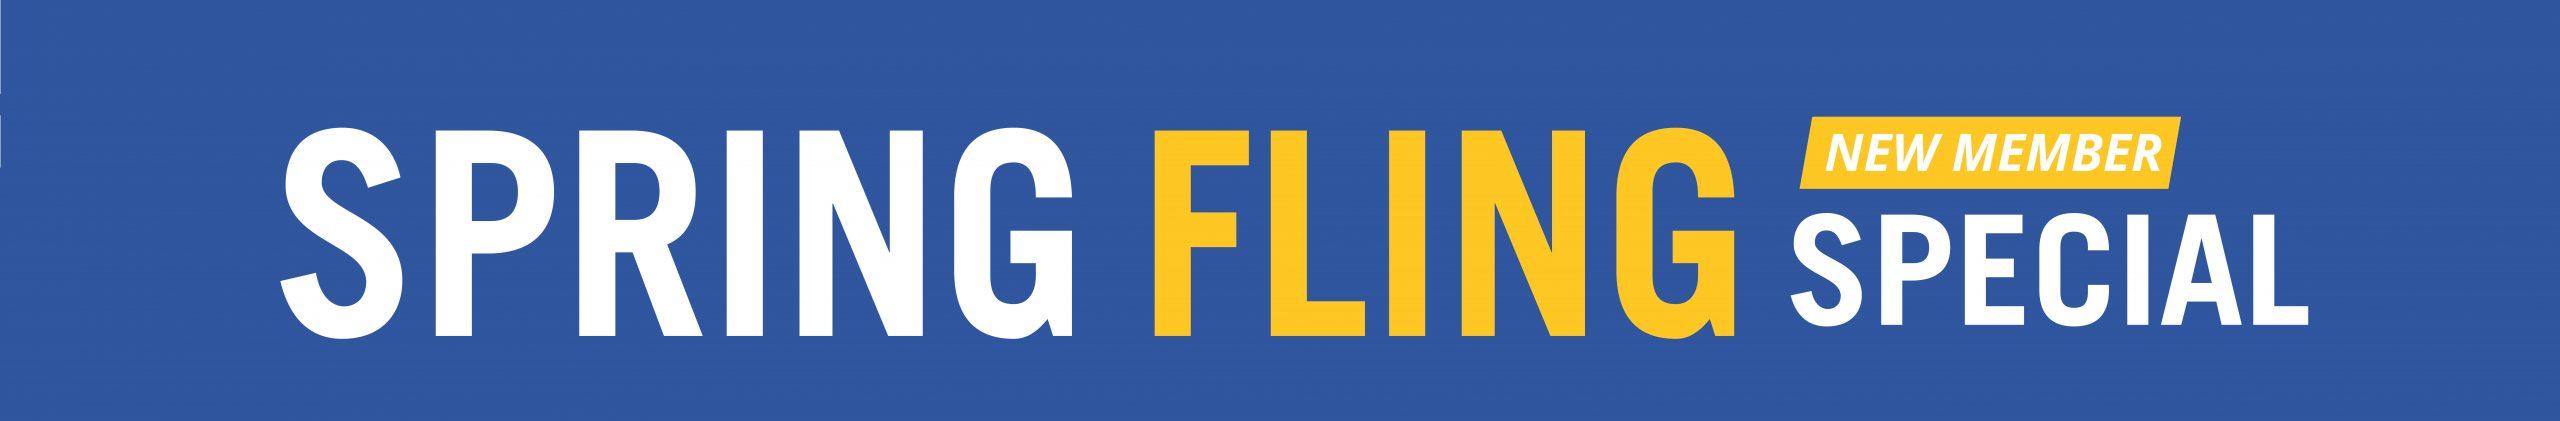 Mount Fitness Spring Fling 2021